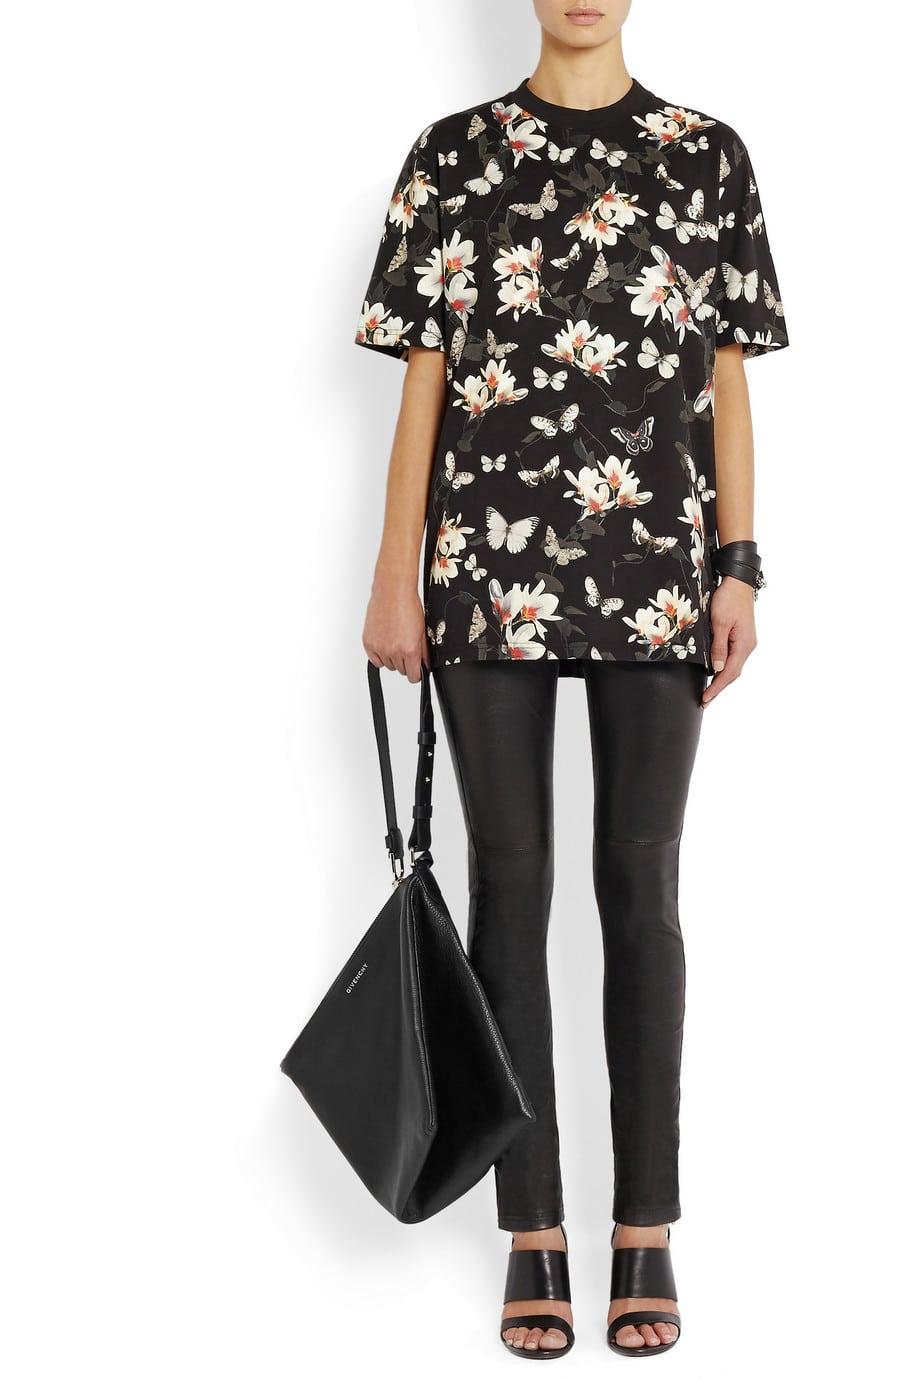 3x is scheepsrecht Givenchy tas